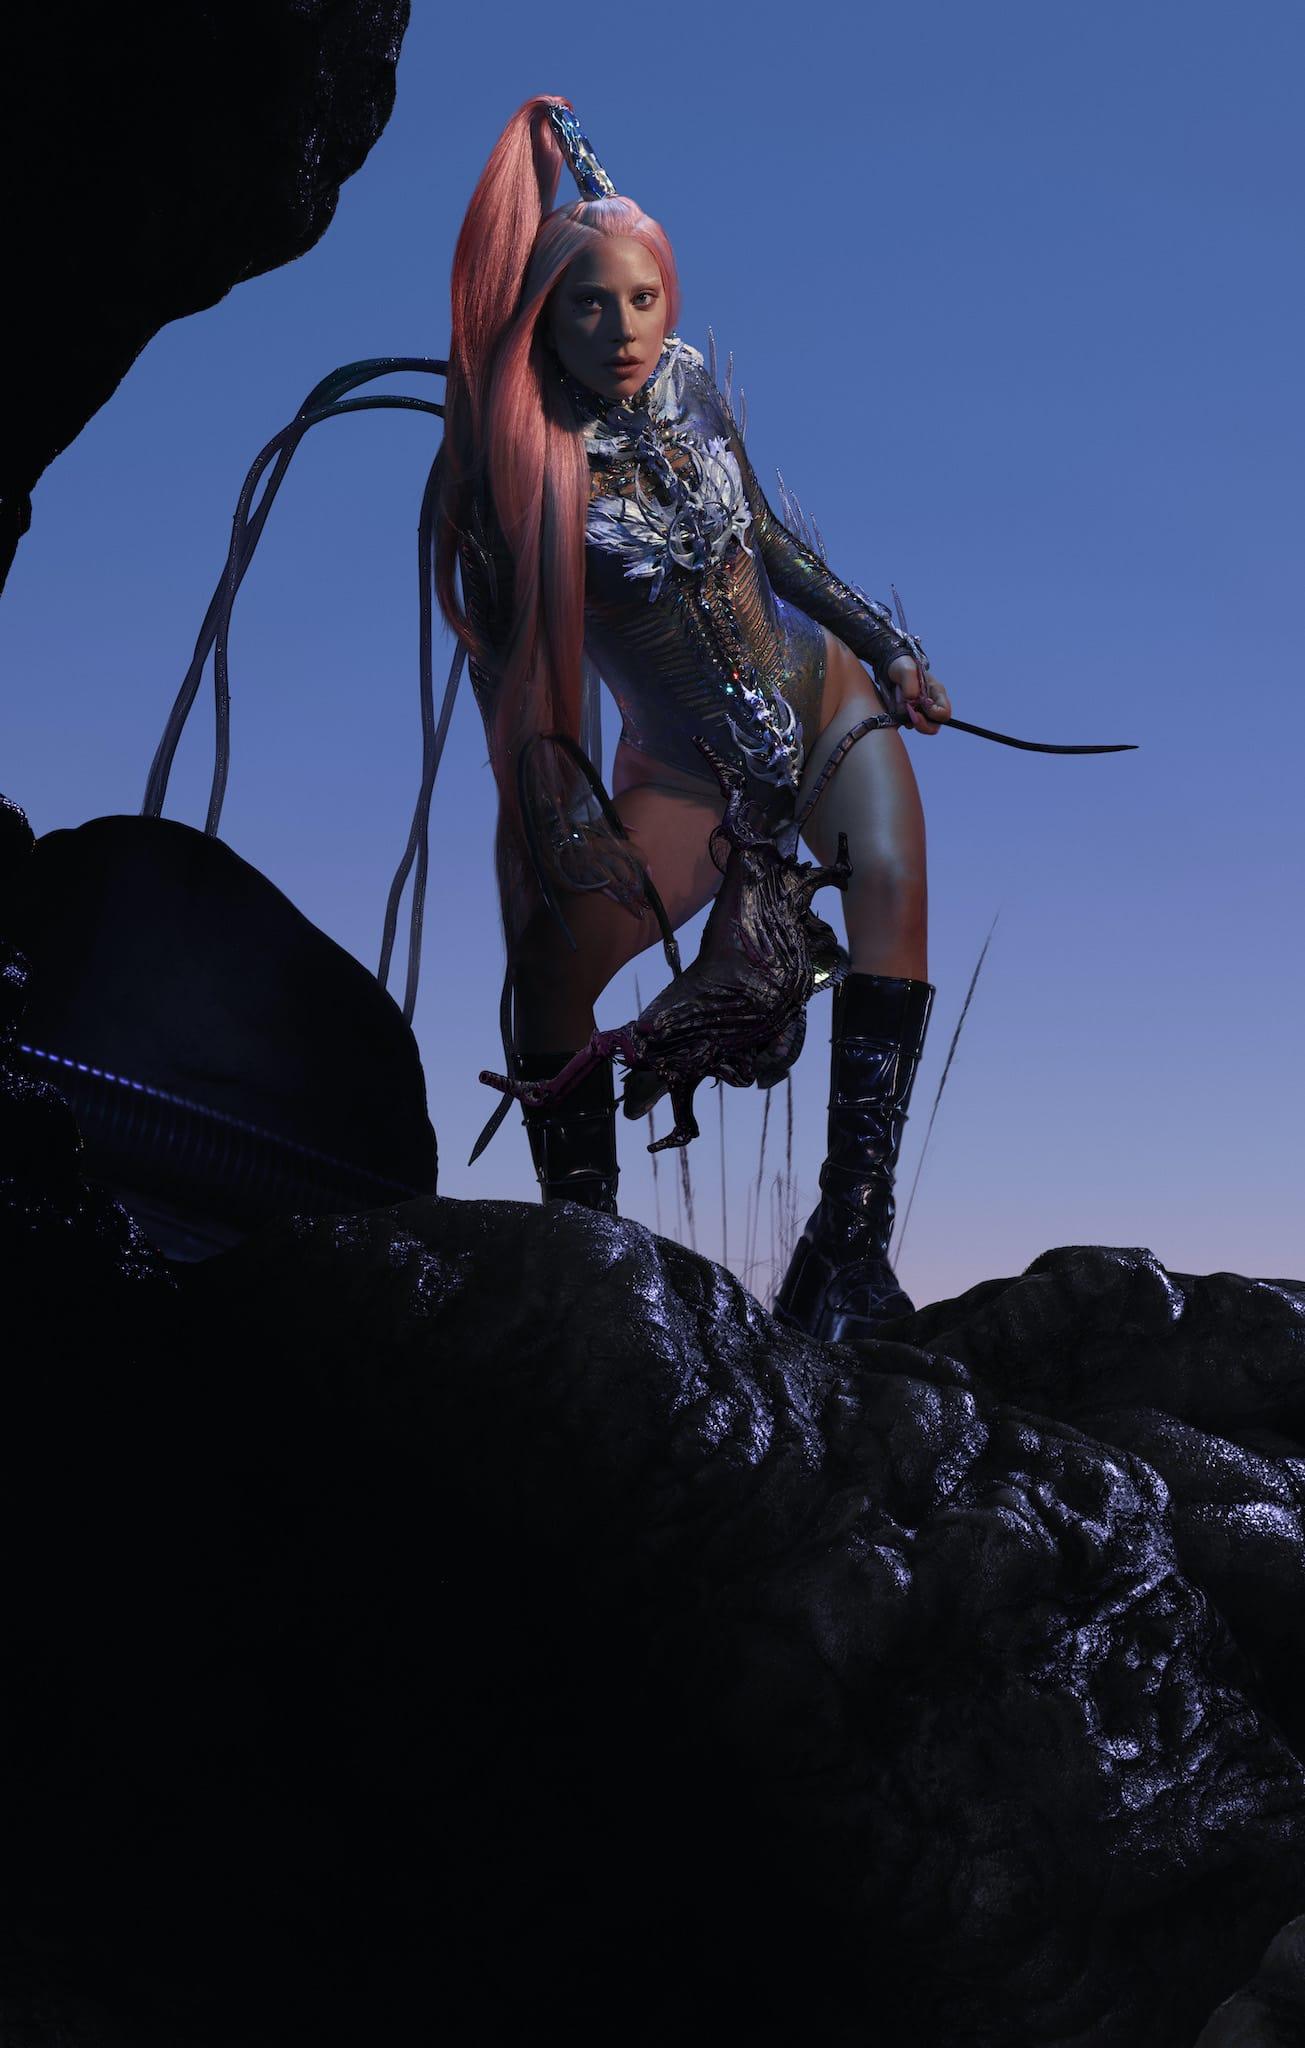 Lady Gaga Chromatica image musique